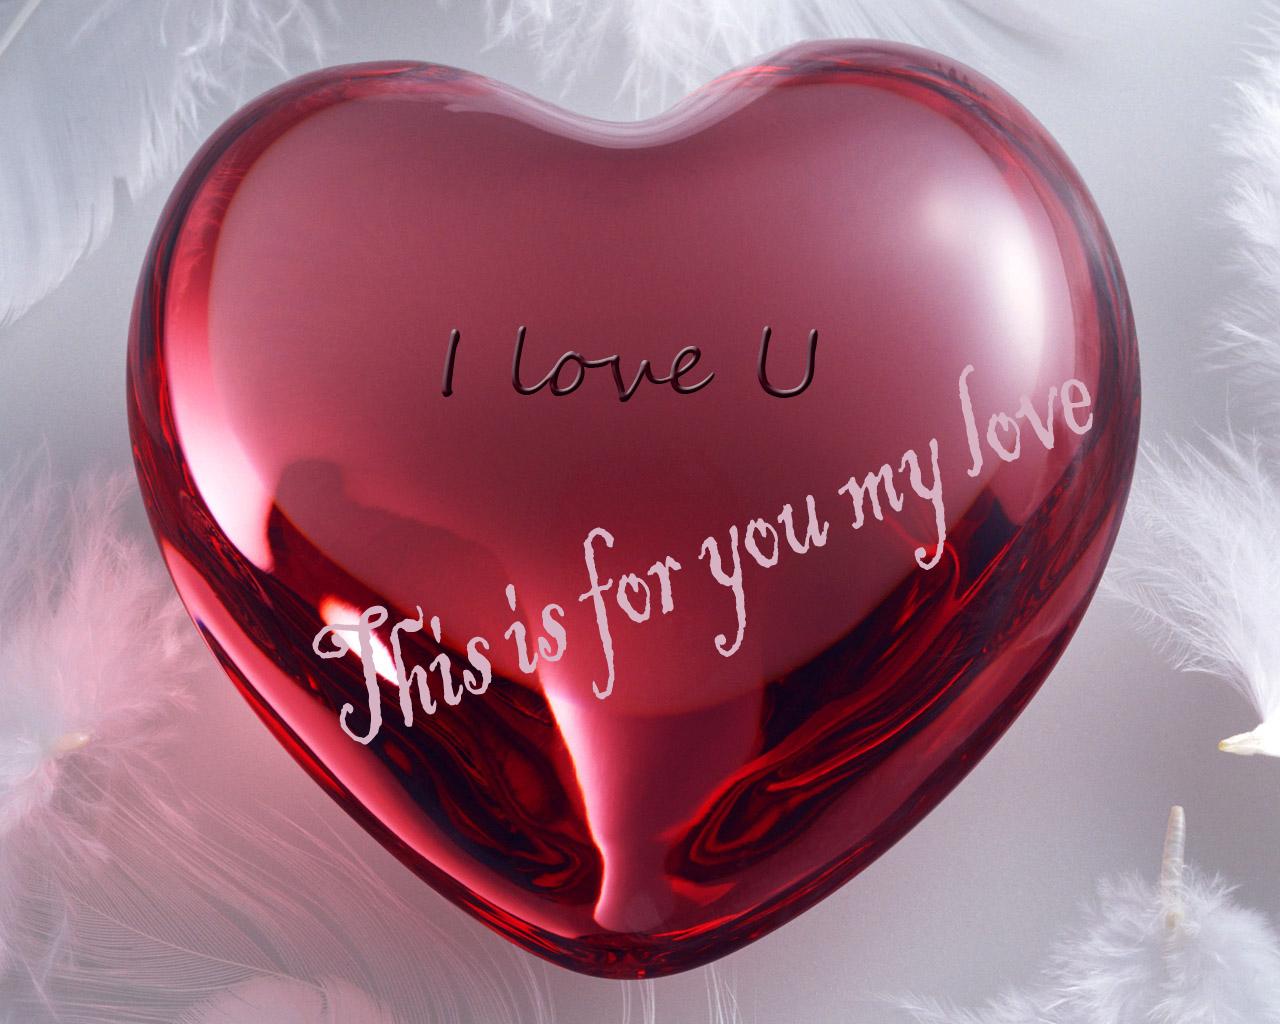 HAPPY VALENTINEu0027S DAY MY LOVE